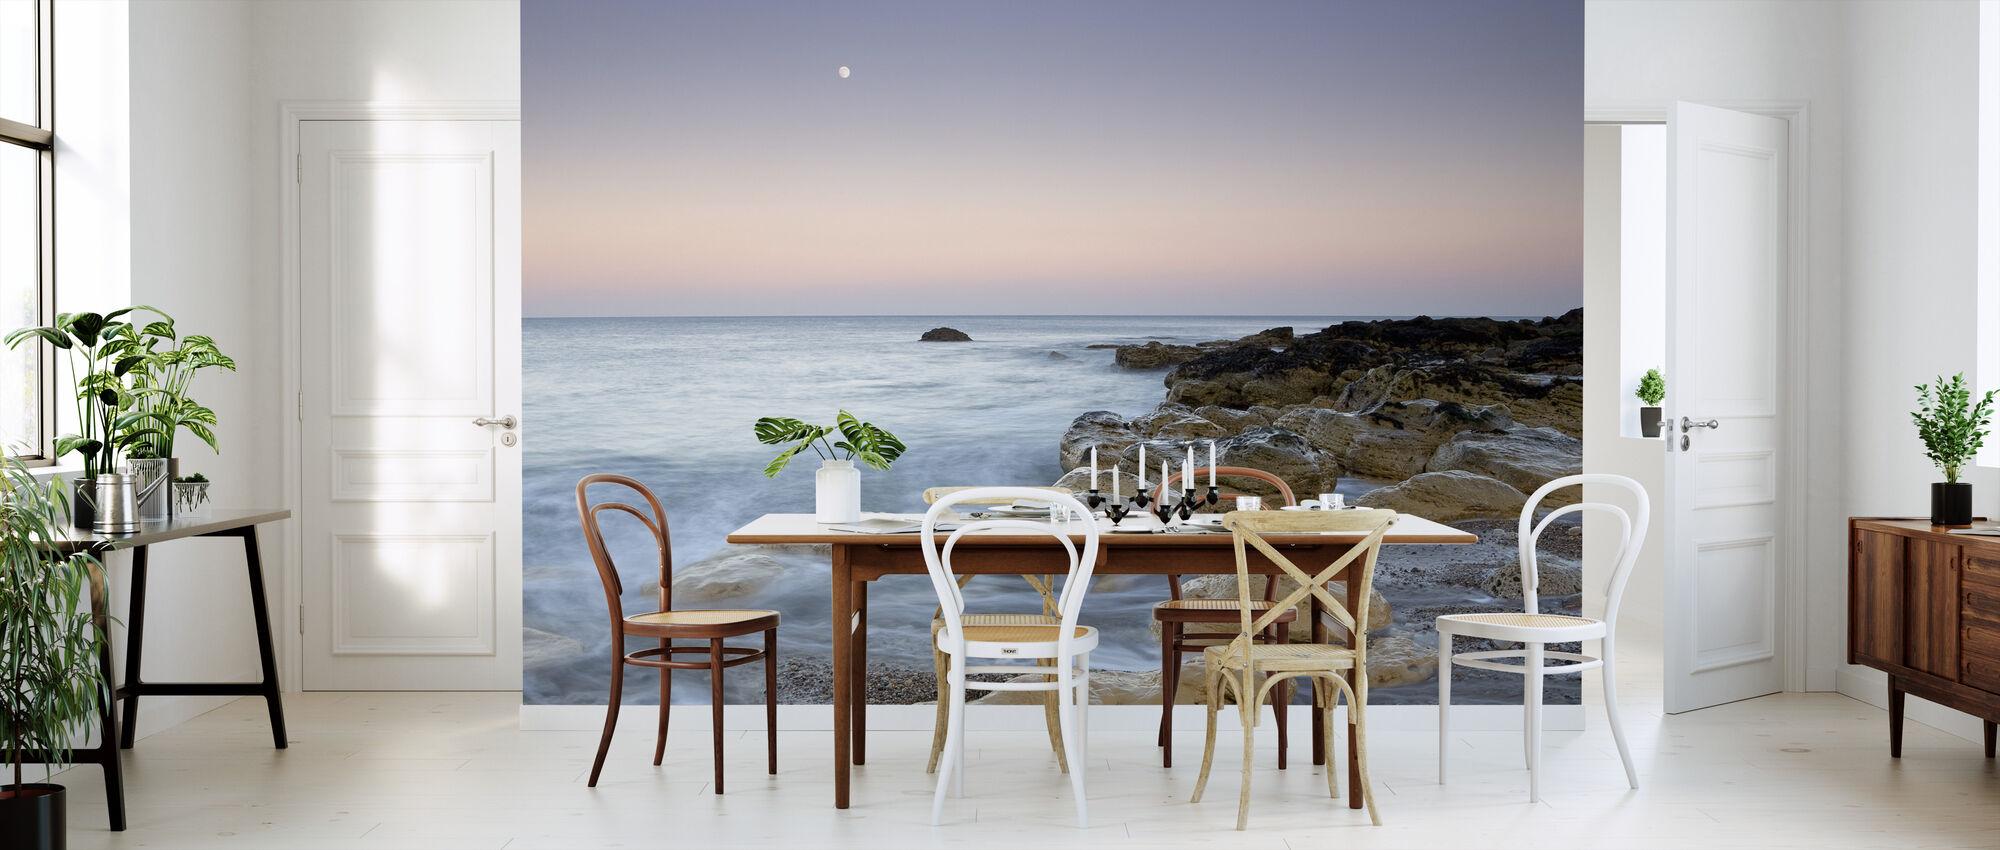 Moonrise over the Sea - Wallpaper - Kitchen